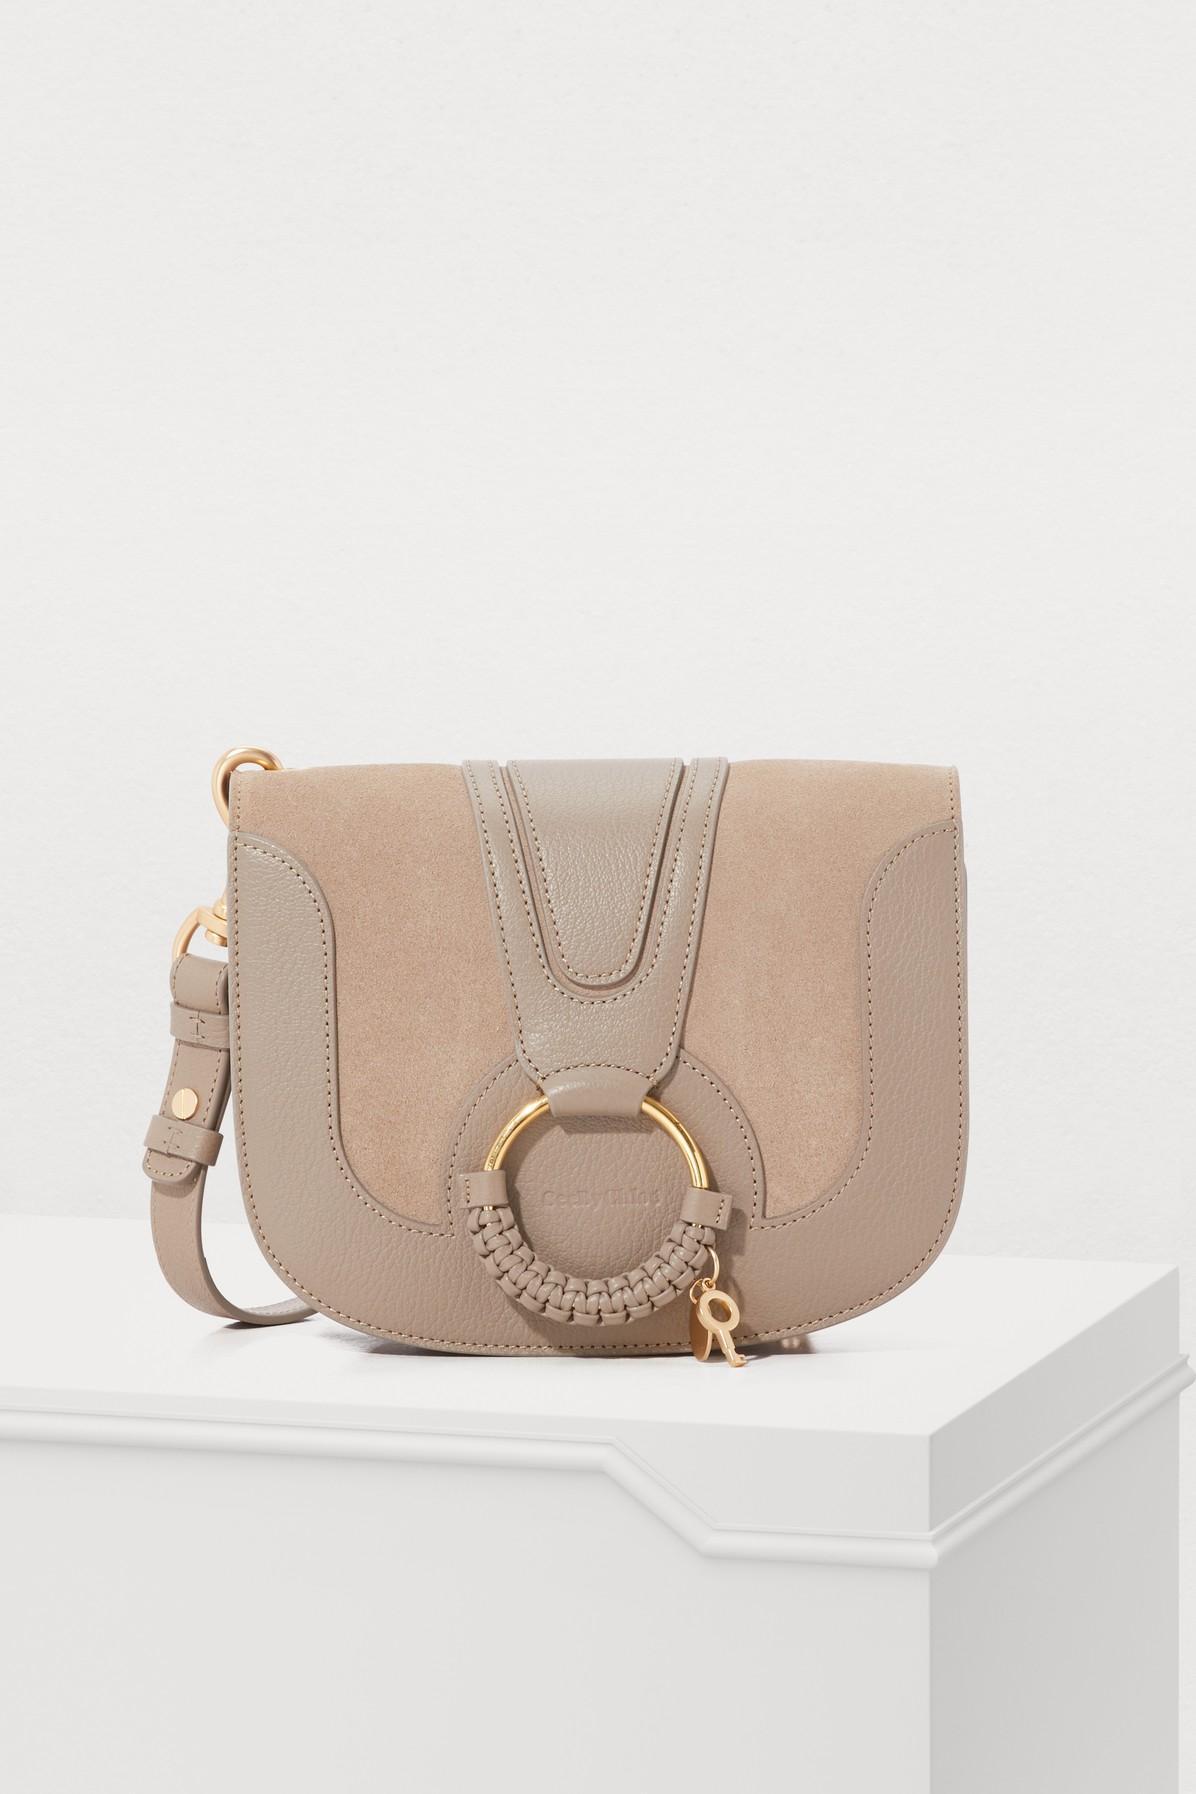 c4be4ca802c2 See By ChloÉ Hana Shoulder Bag In Motty Grey